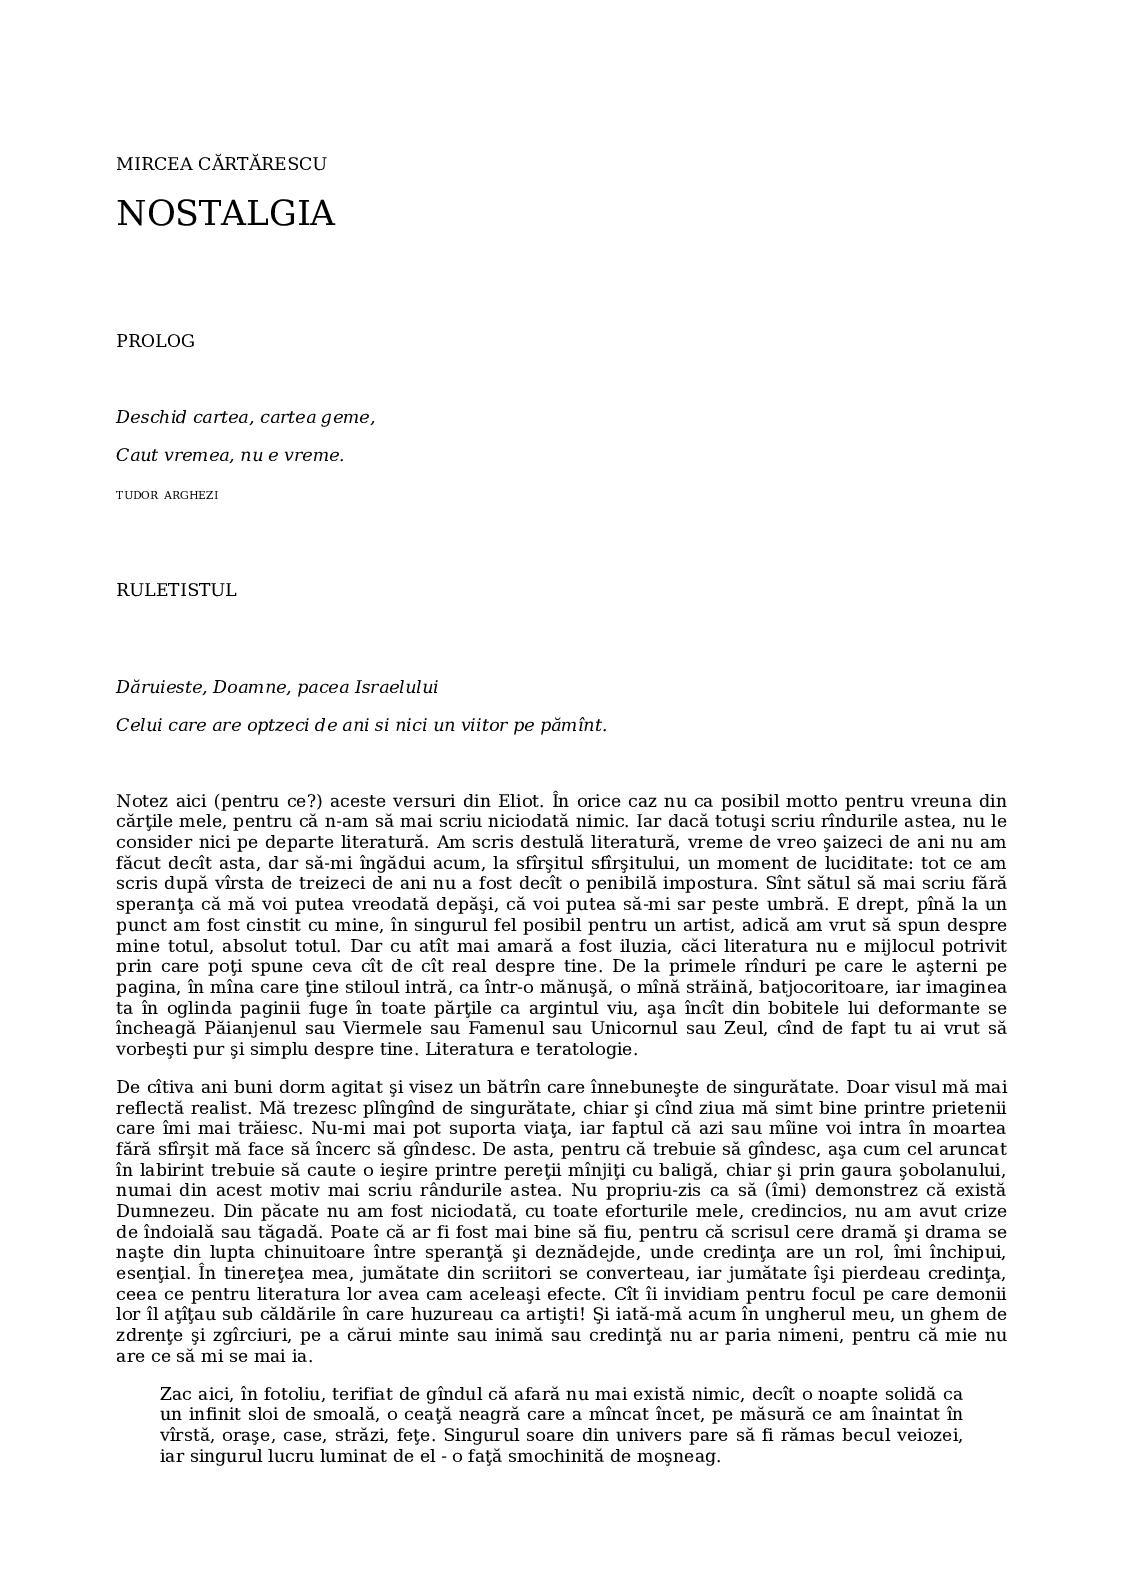 Etapele postului negru – Postul negru